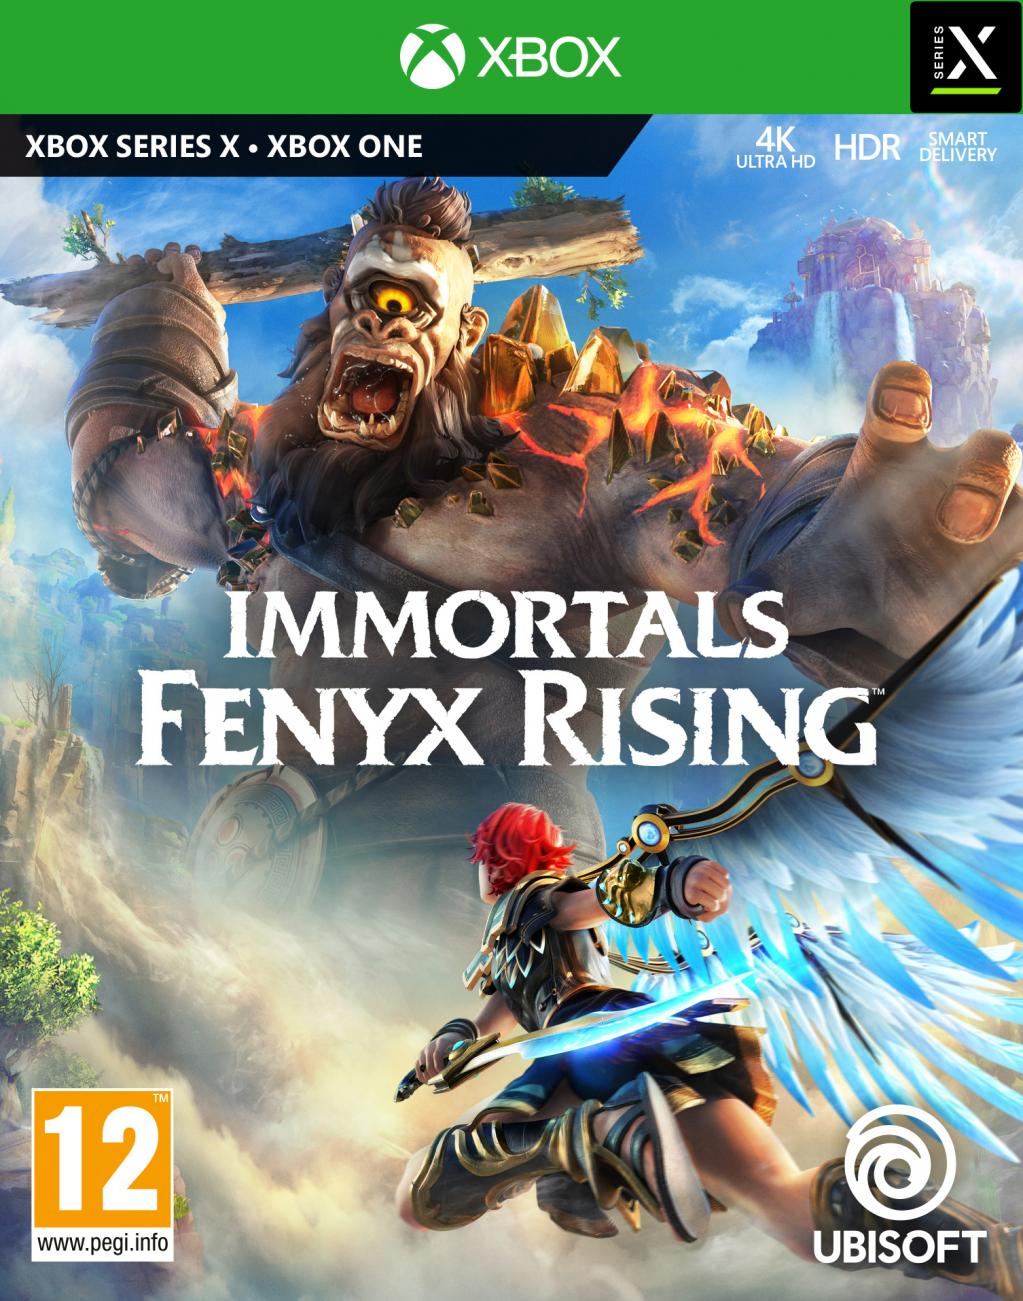 Immortals Fenyx Rising  - XBOX ONE / XBOX SERIES X_1